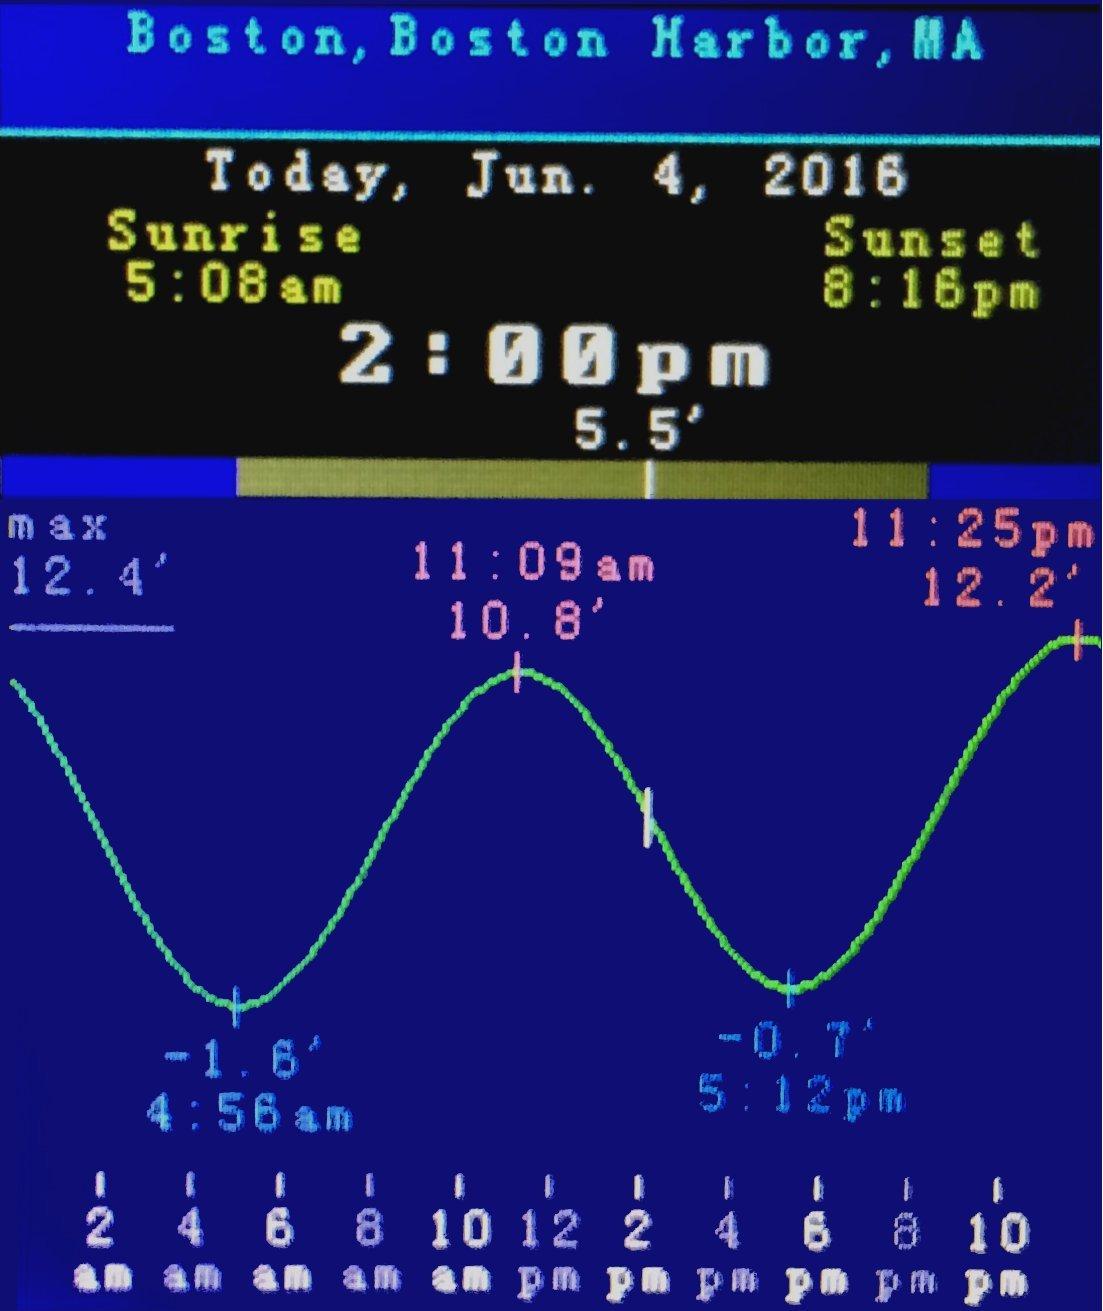 Amazon digital tide clock north america pacific atlantic amazon digital tide clock north america pacific atlantic gulf of mexico usa canada 5500 sites across the continent plus digital aquarium nvjuhfo Choice Image